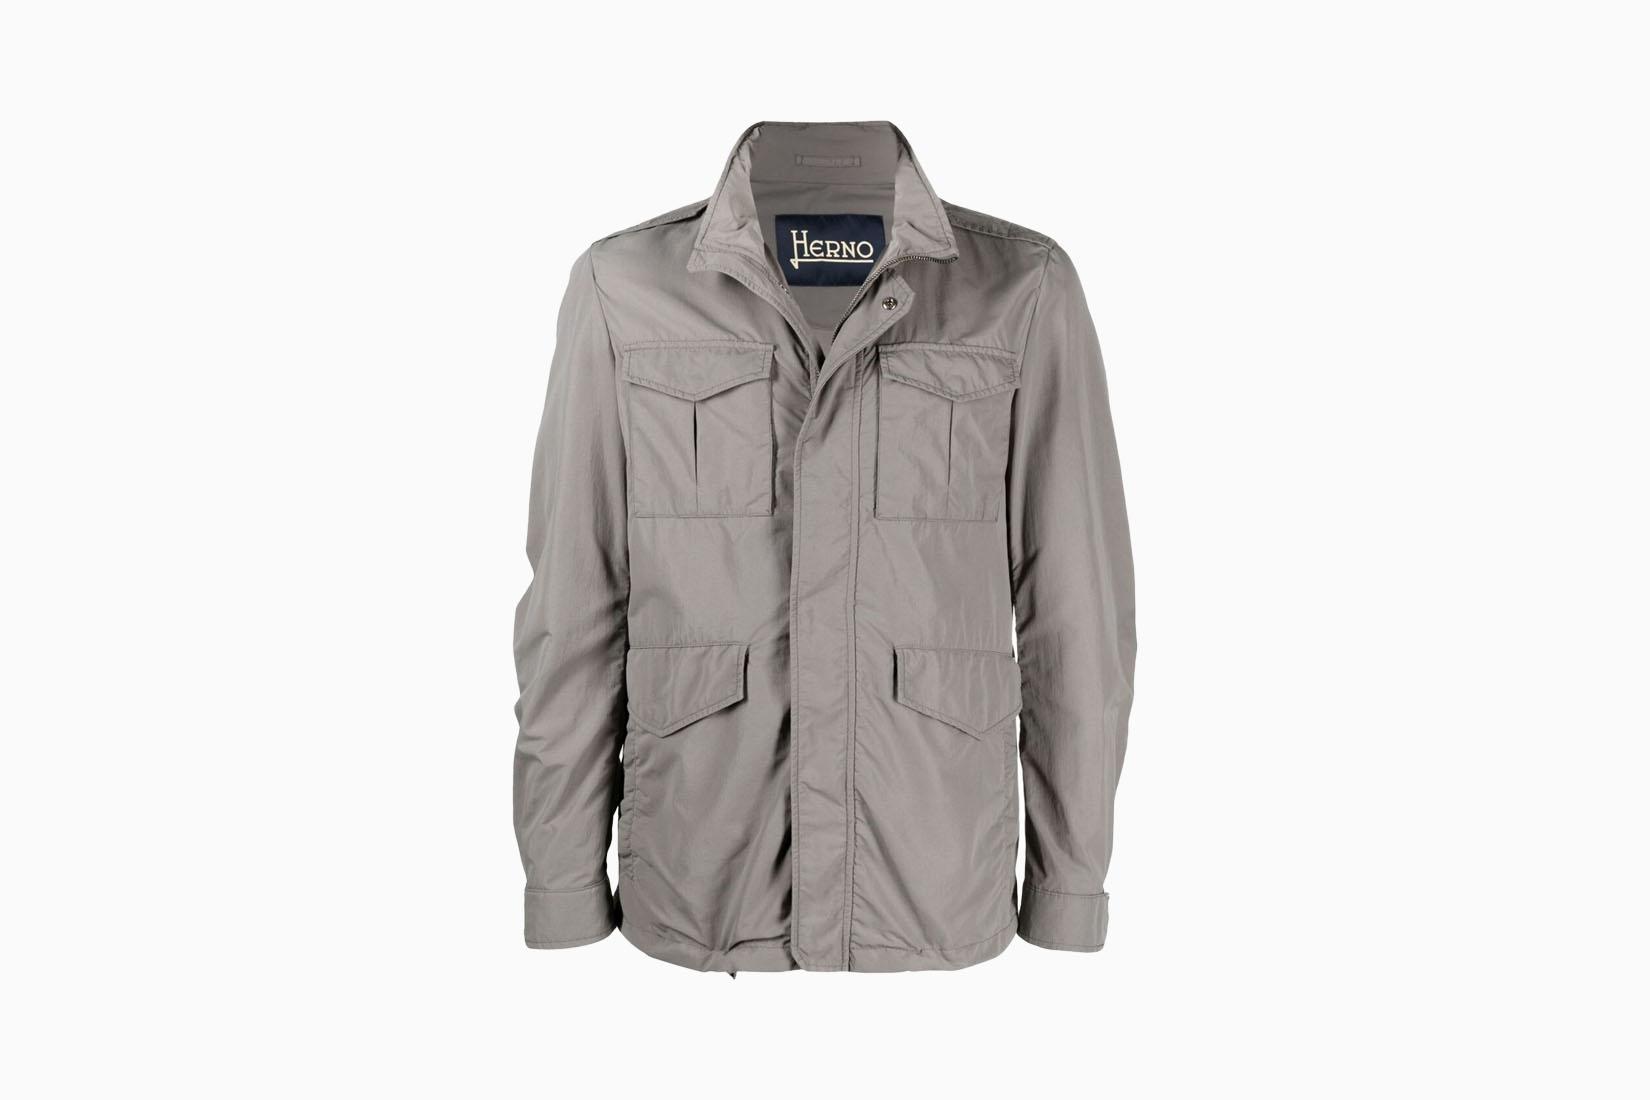 best men field jackets herno review Luxe Digital